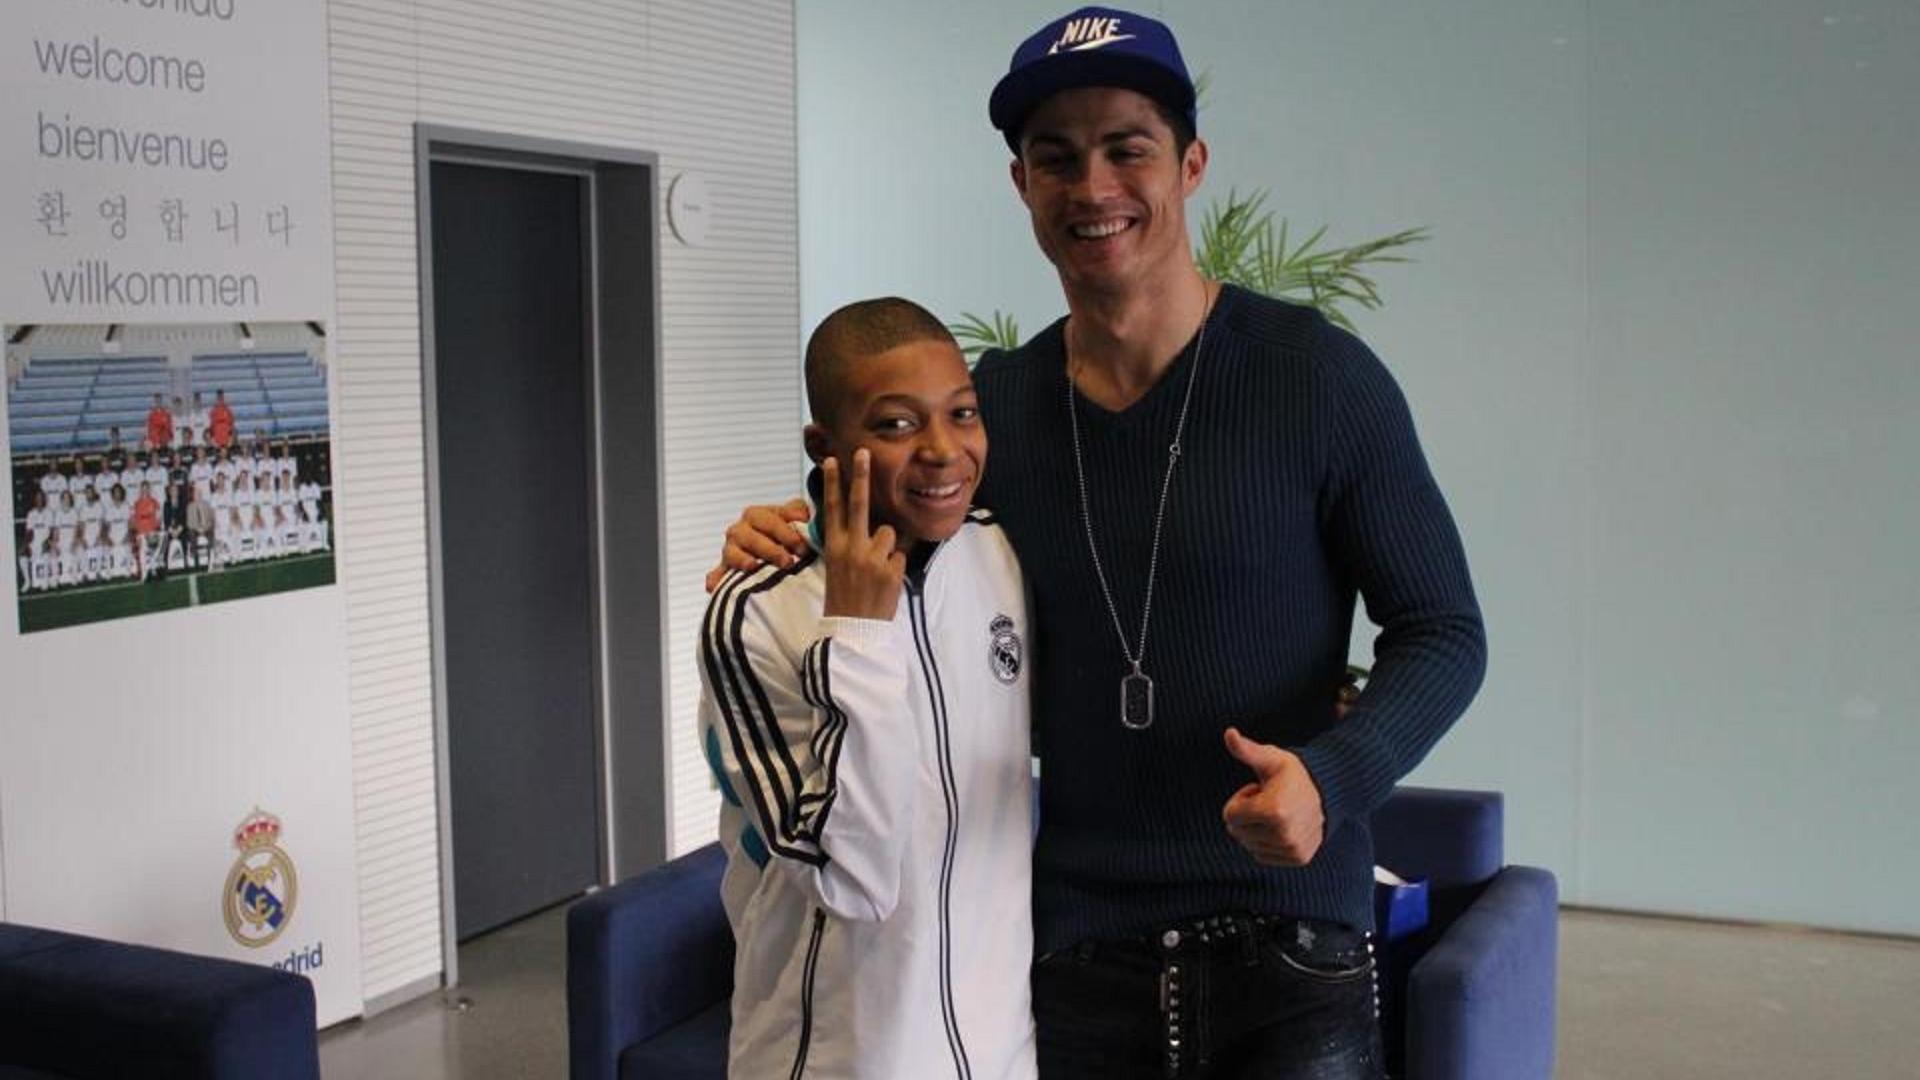 Kylian Mbappé Cristiano Ronaldo 2012